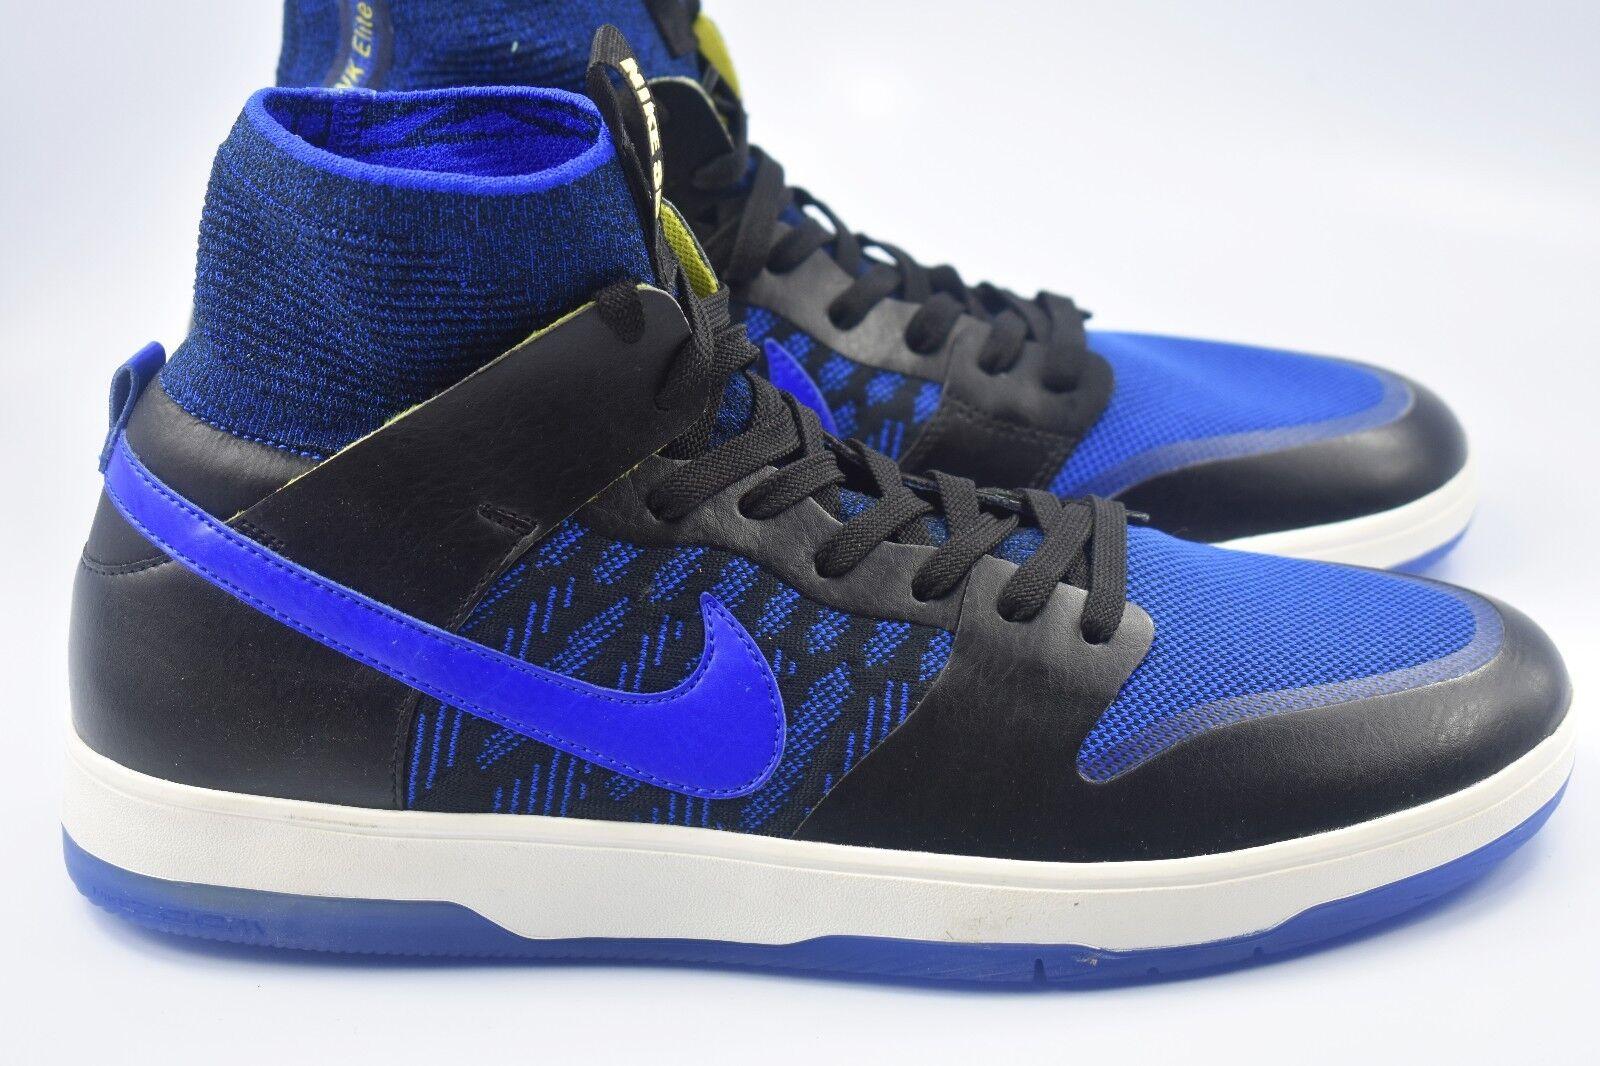 Nike SB Zoom Dunk High ELT QS Mens Size 11.5 Shoes 918287 041 Skateboarding